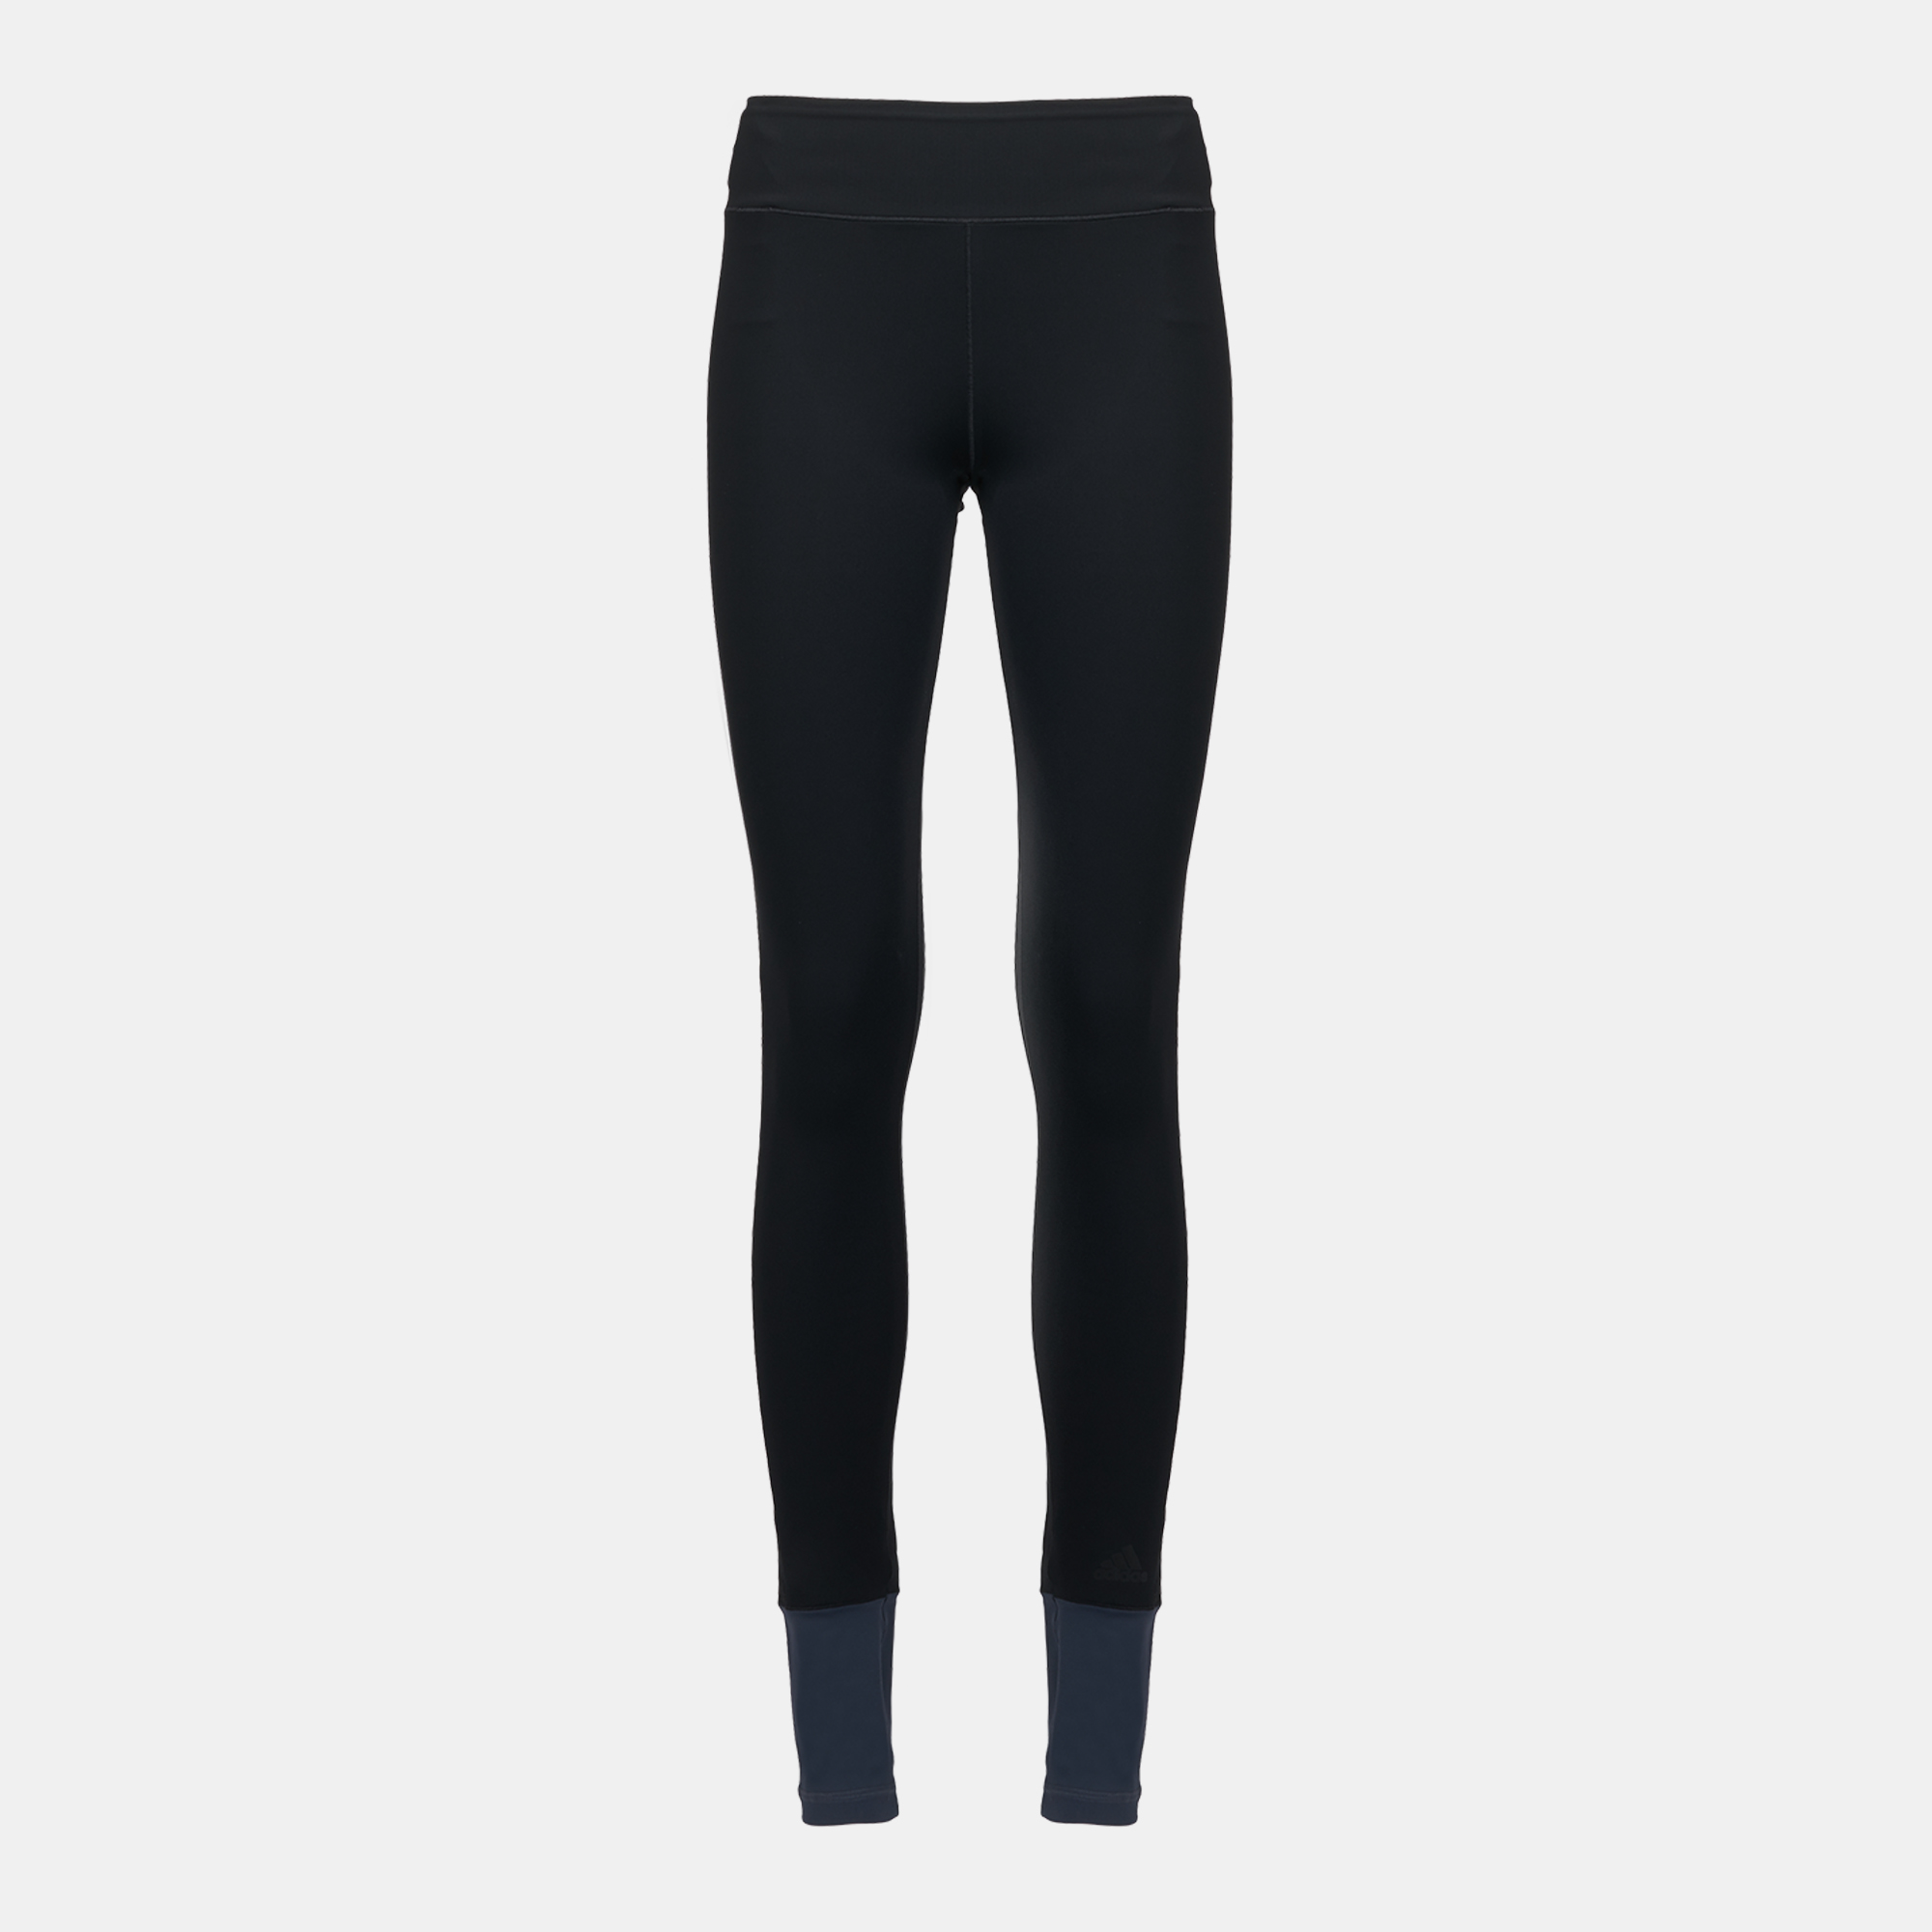 Superlong For Ultimate Shop Fit By Womens Adidas Leggings Black WCeBrdox